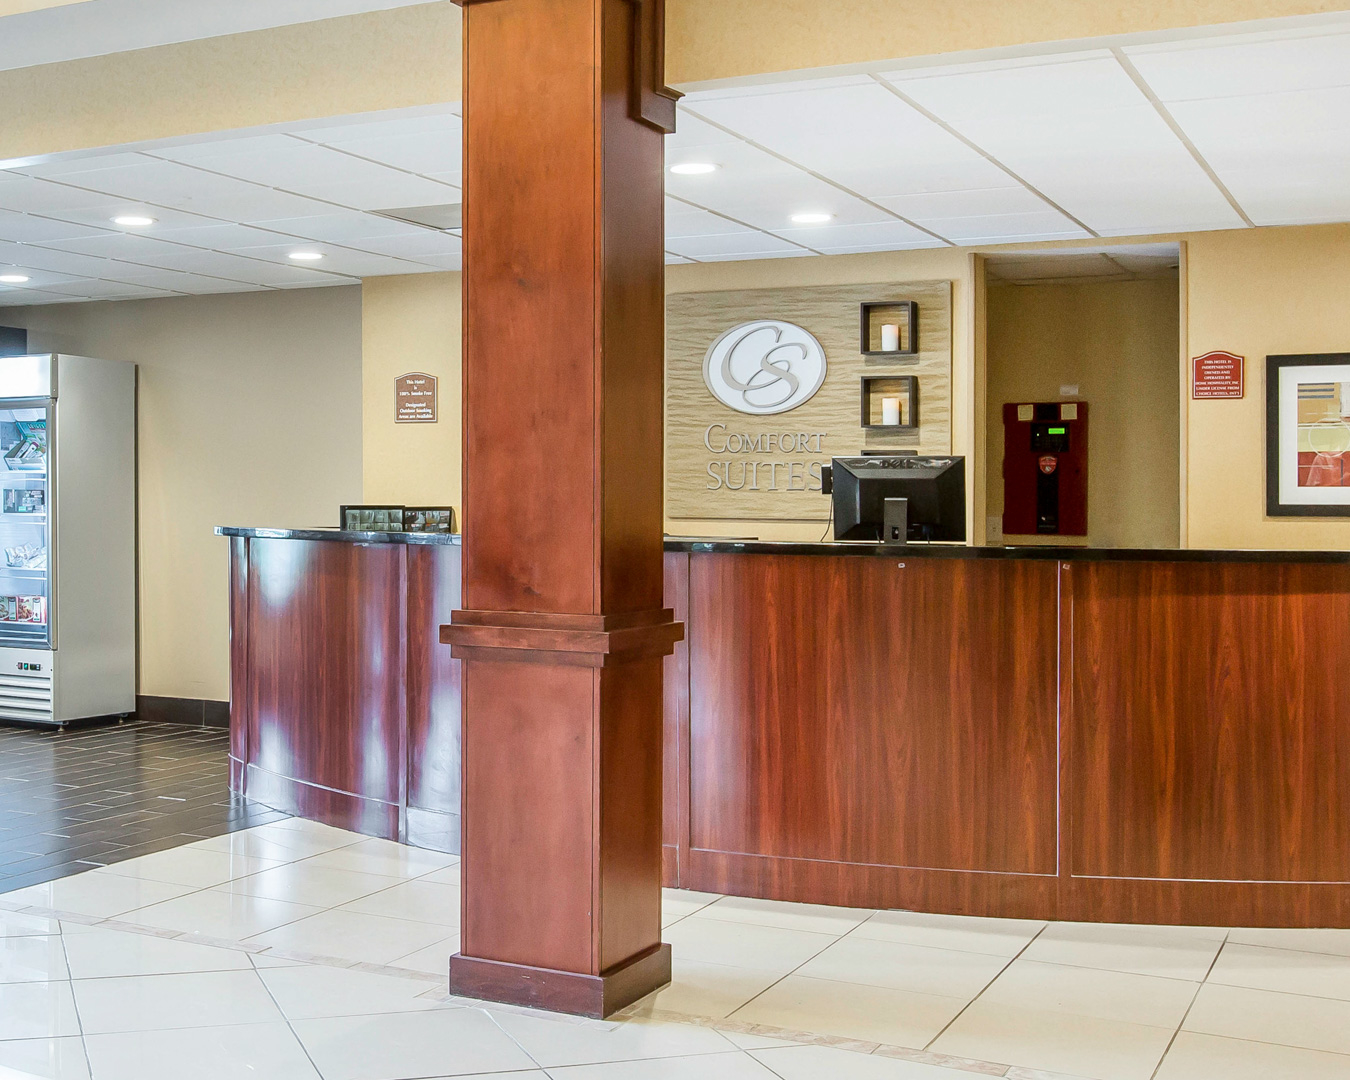 Comfort Suites Atlanta Airport image 1